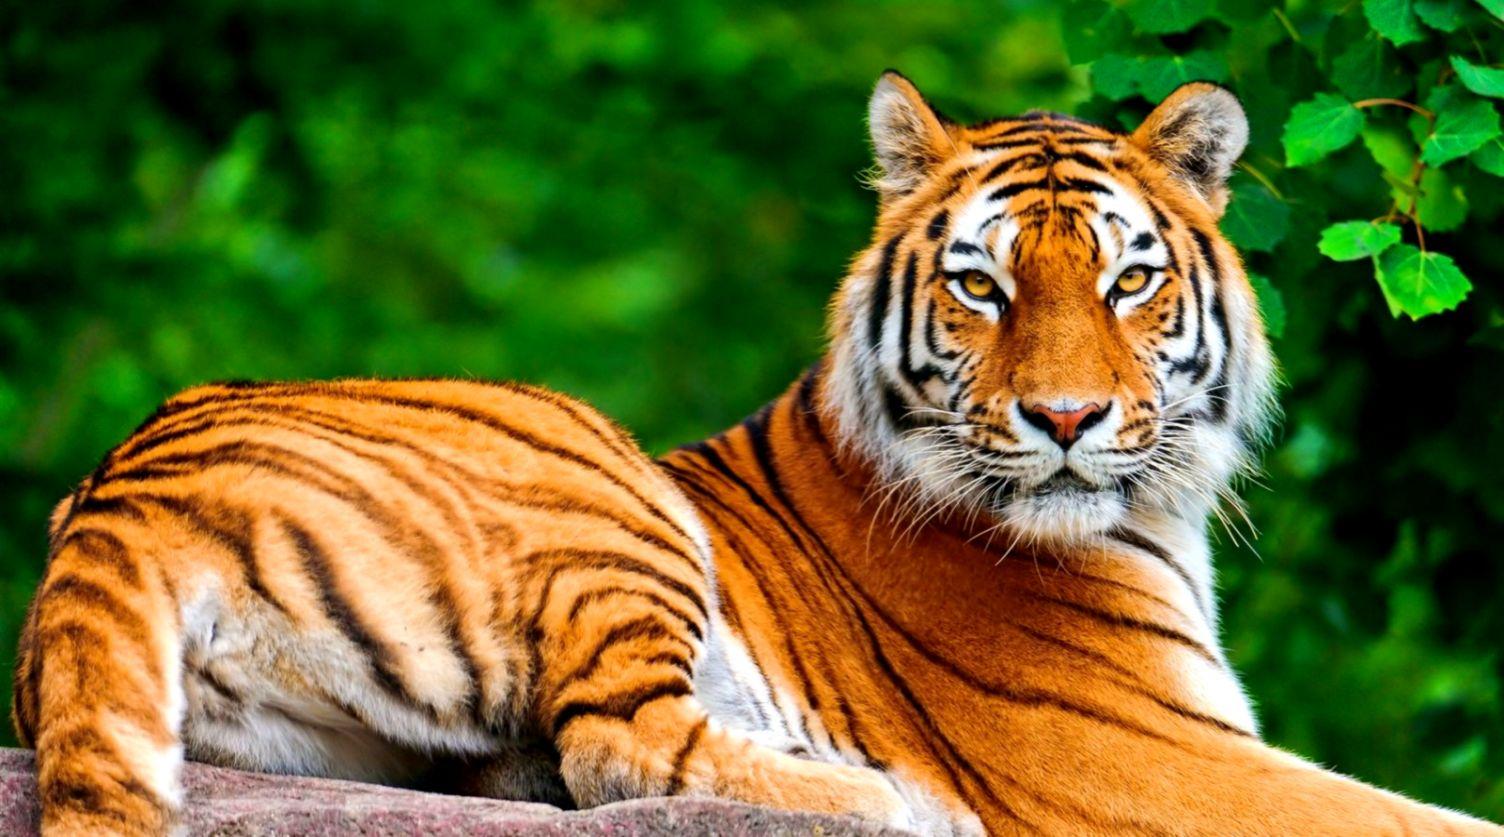 1080P Hd Wallpaper Animals | Wallpapers Photos